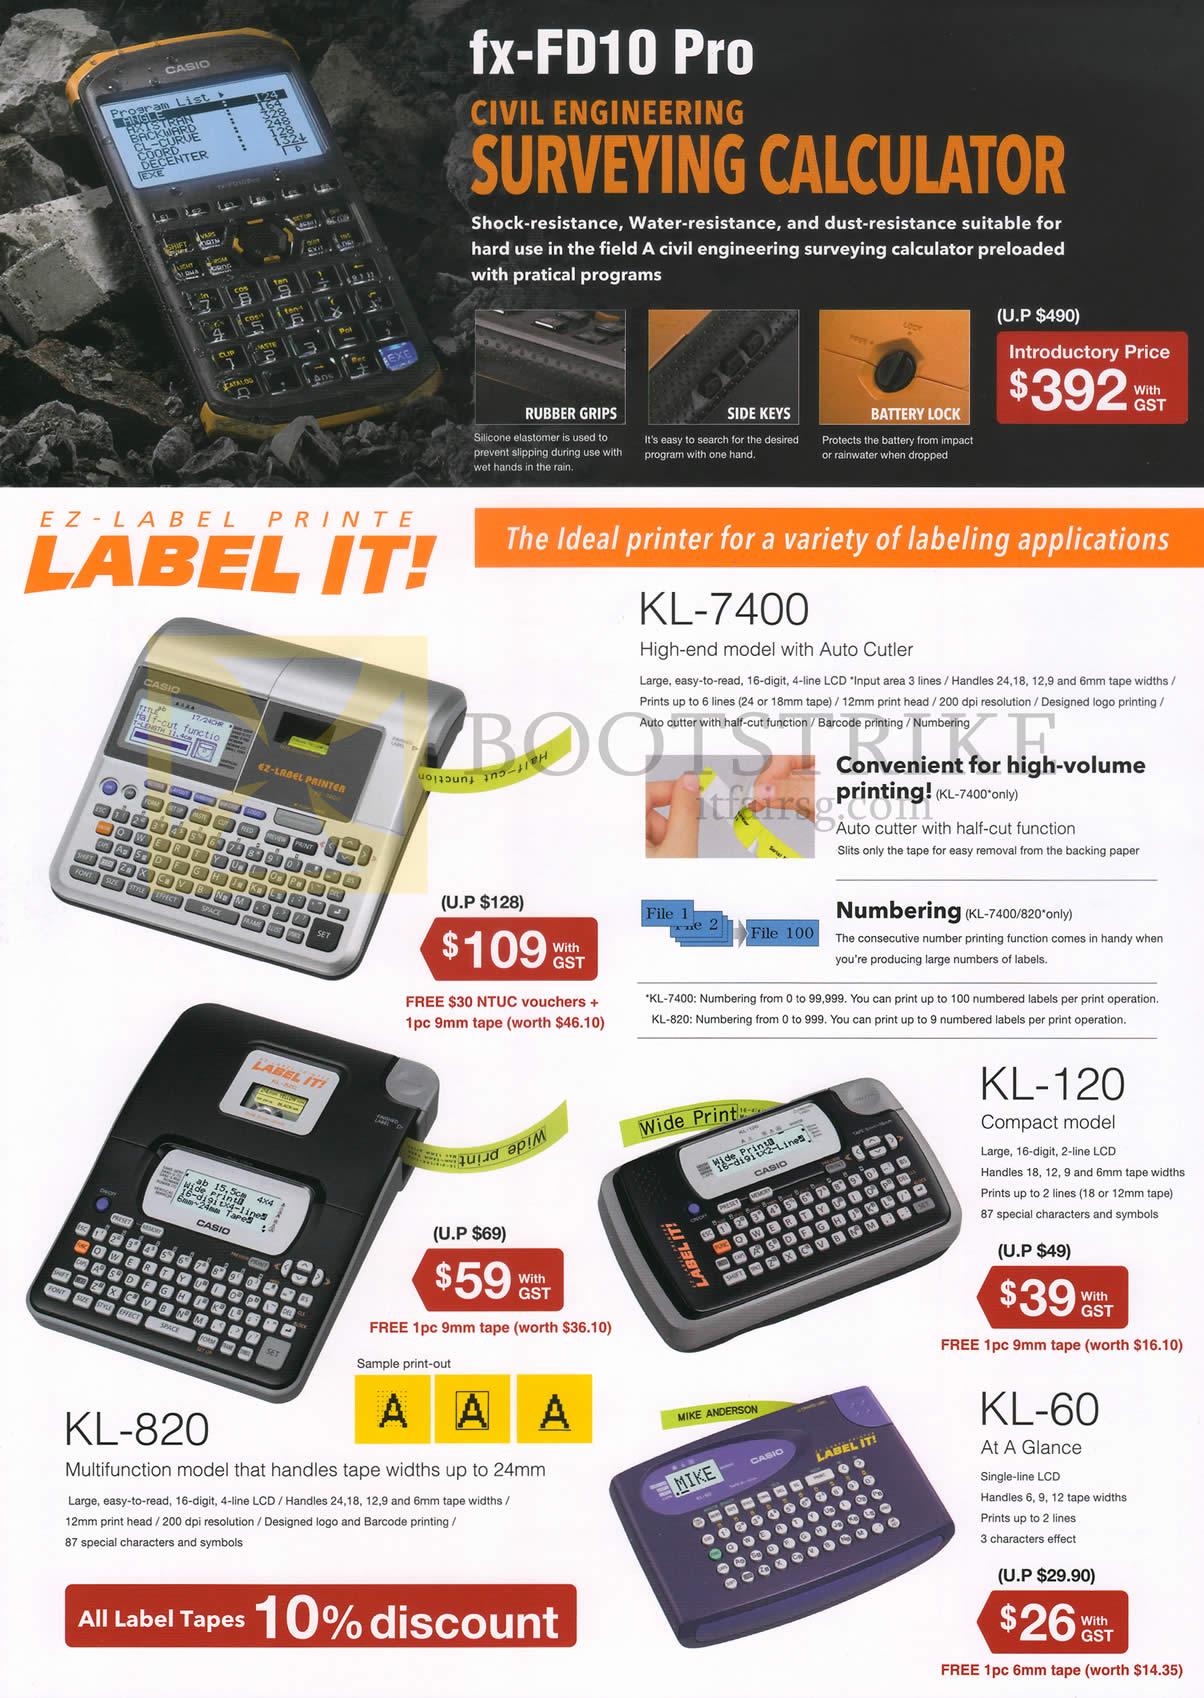 SITEX 2014 price list image brochure of Casio Labellers KL-7400, KL-120, KL-60, KL-820